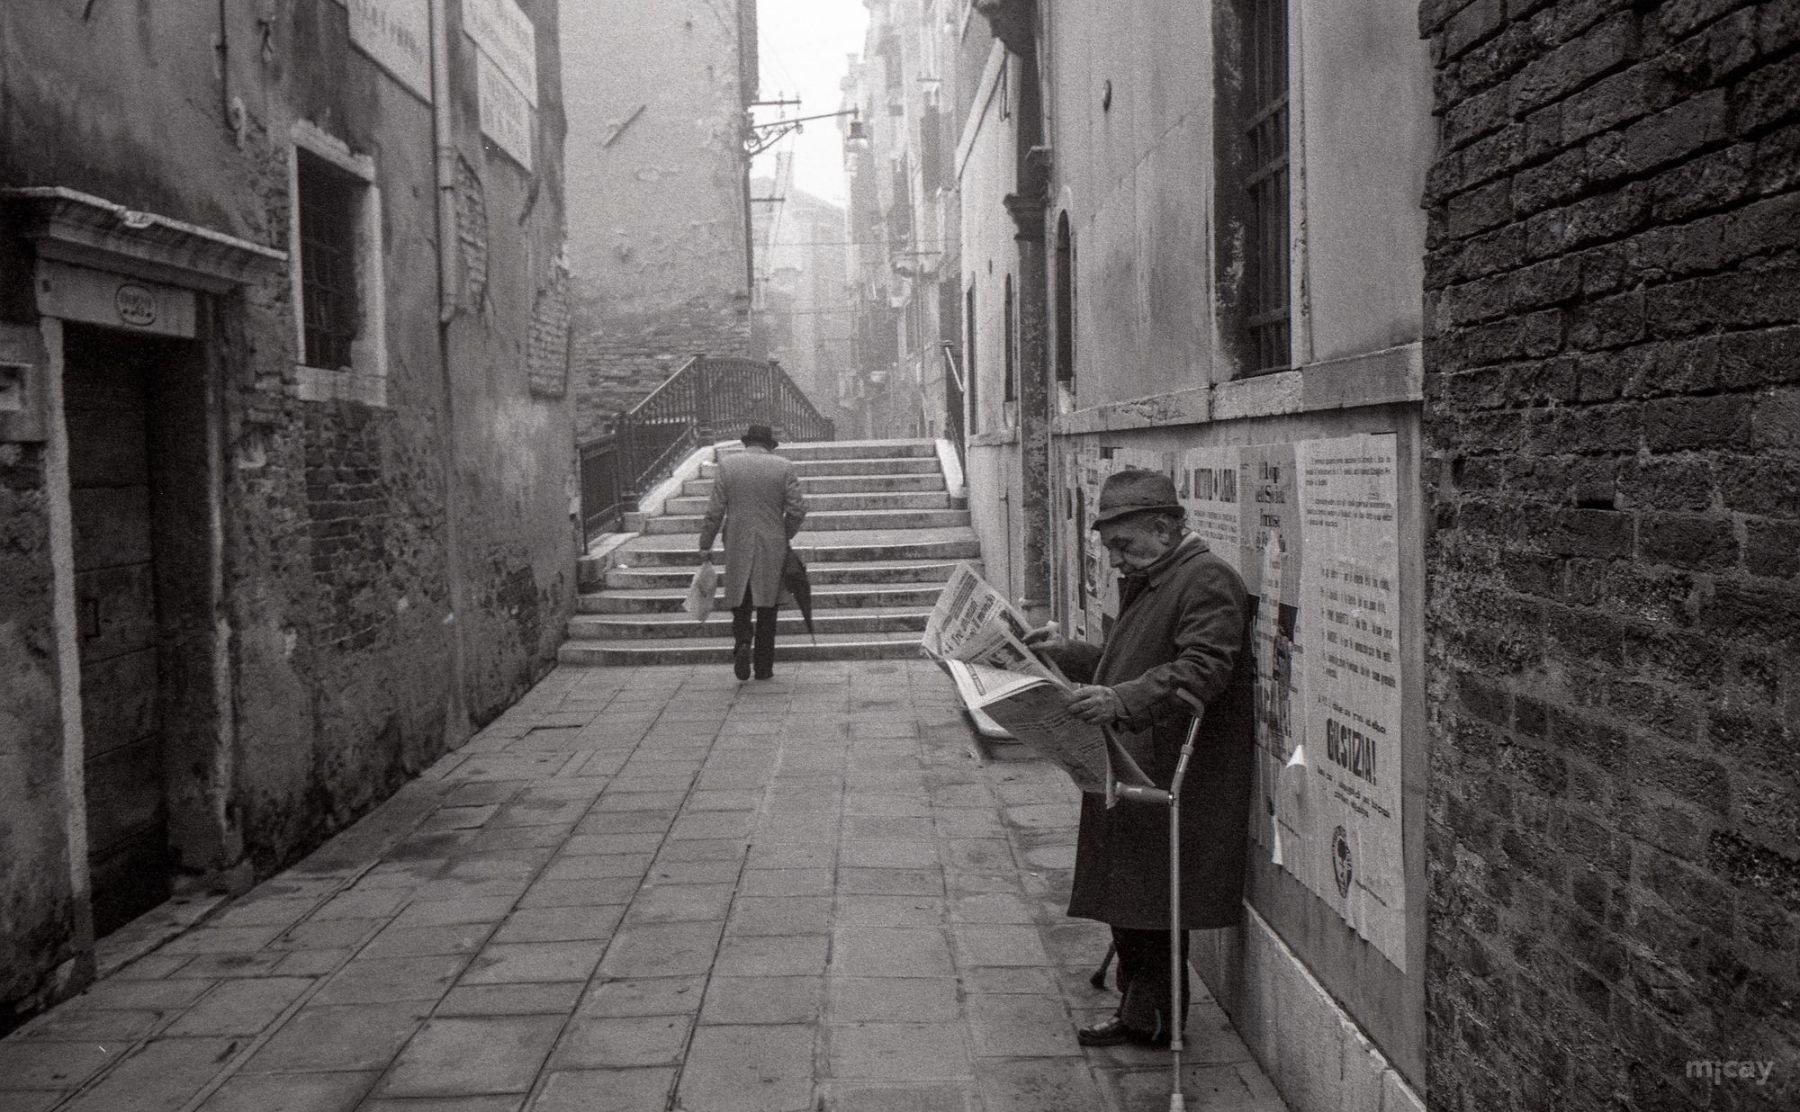 MichelAycaguer-Venise-AquaAlta-Noel-1981-7